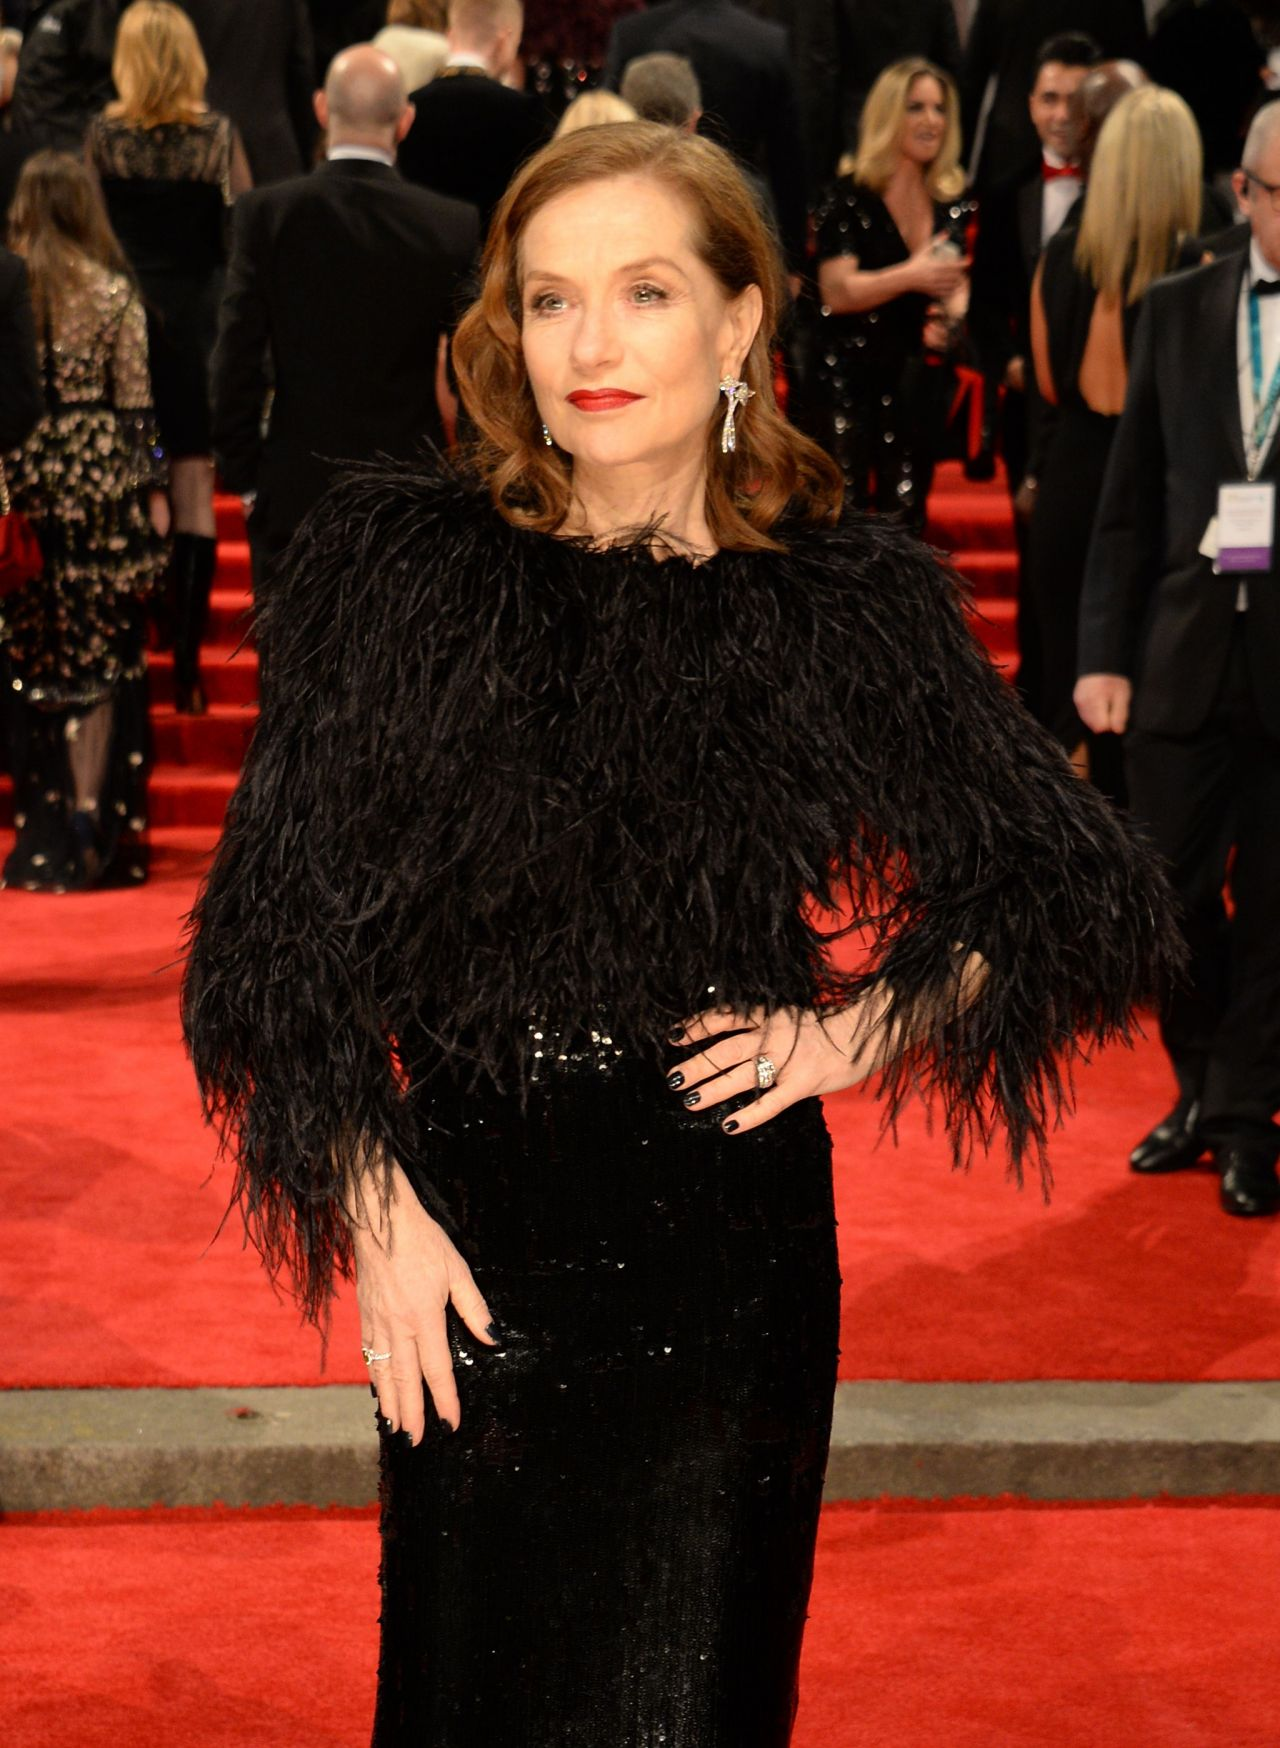 http://celebmafia.com/wp-content/uploads/2018/02/isabelle-huppert-2018-british-academy-film-awards-2.jpg